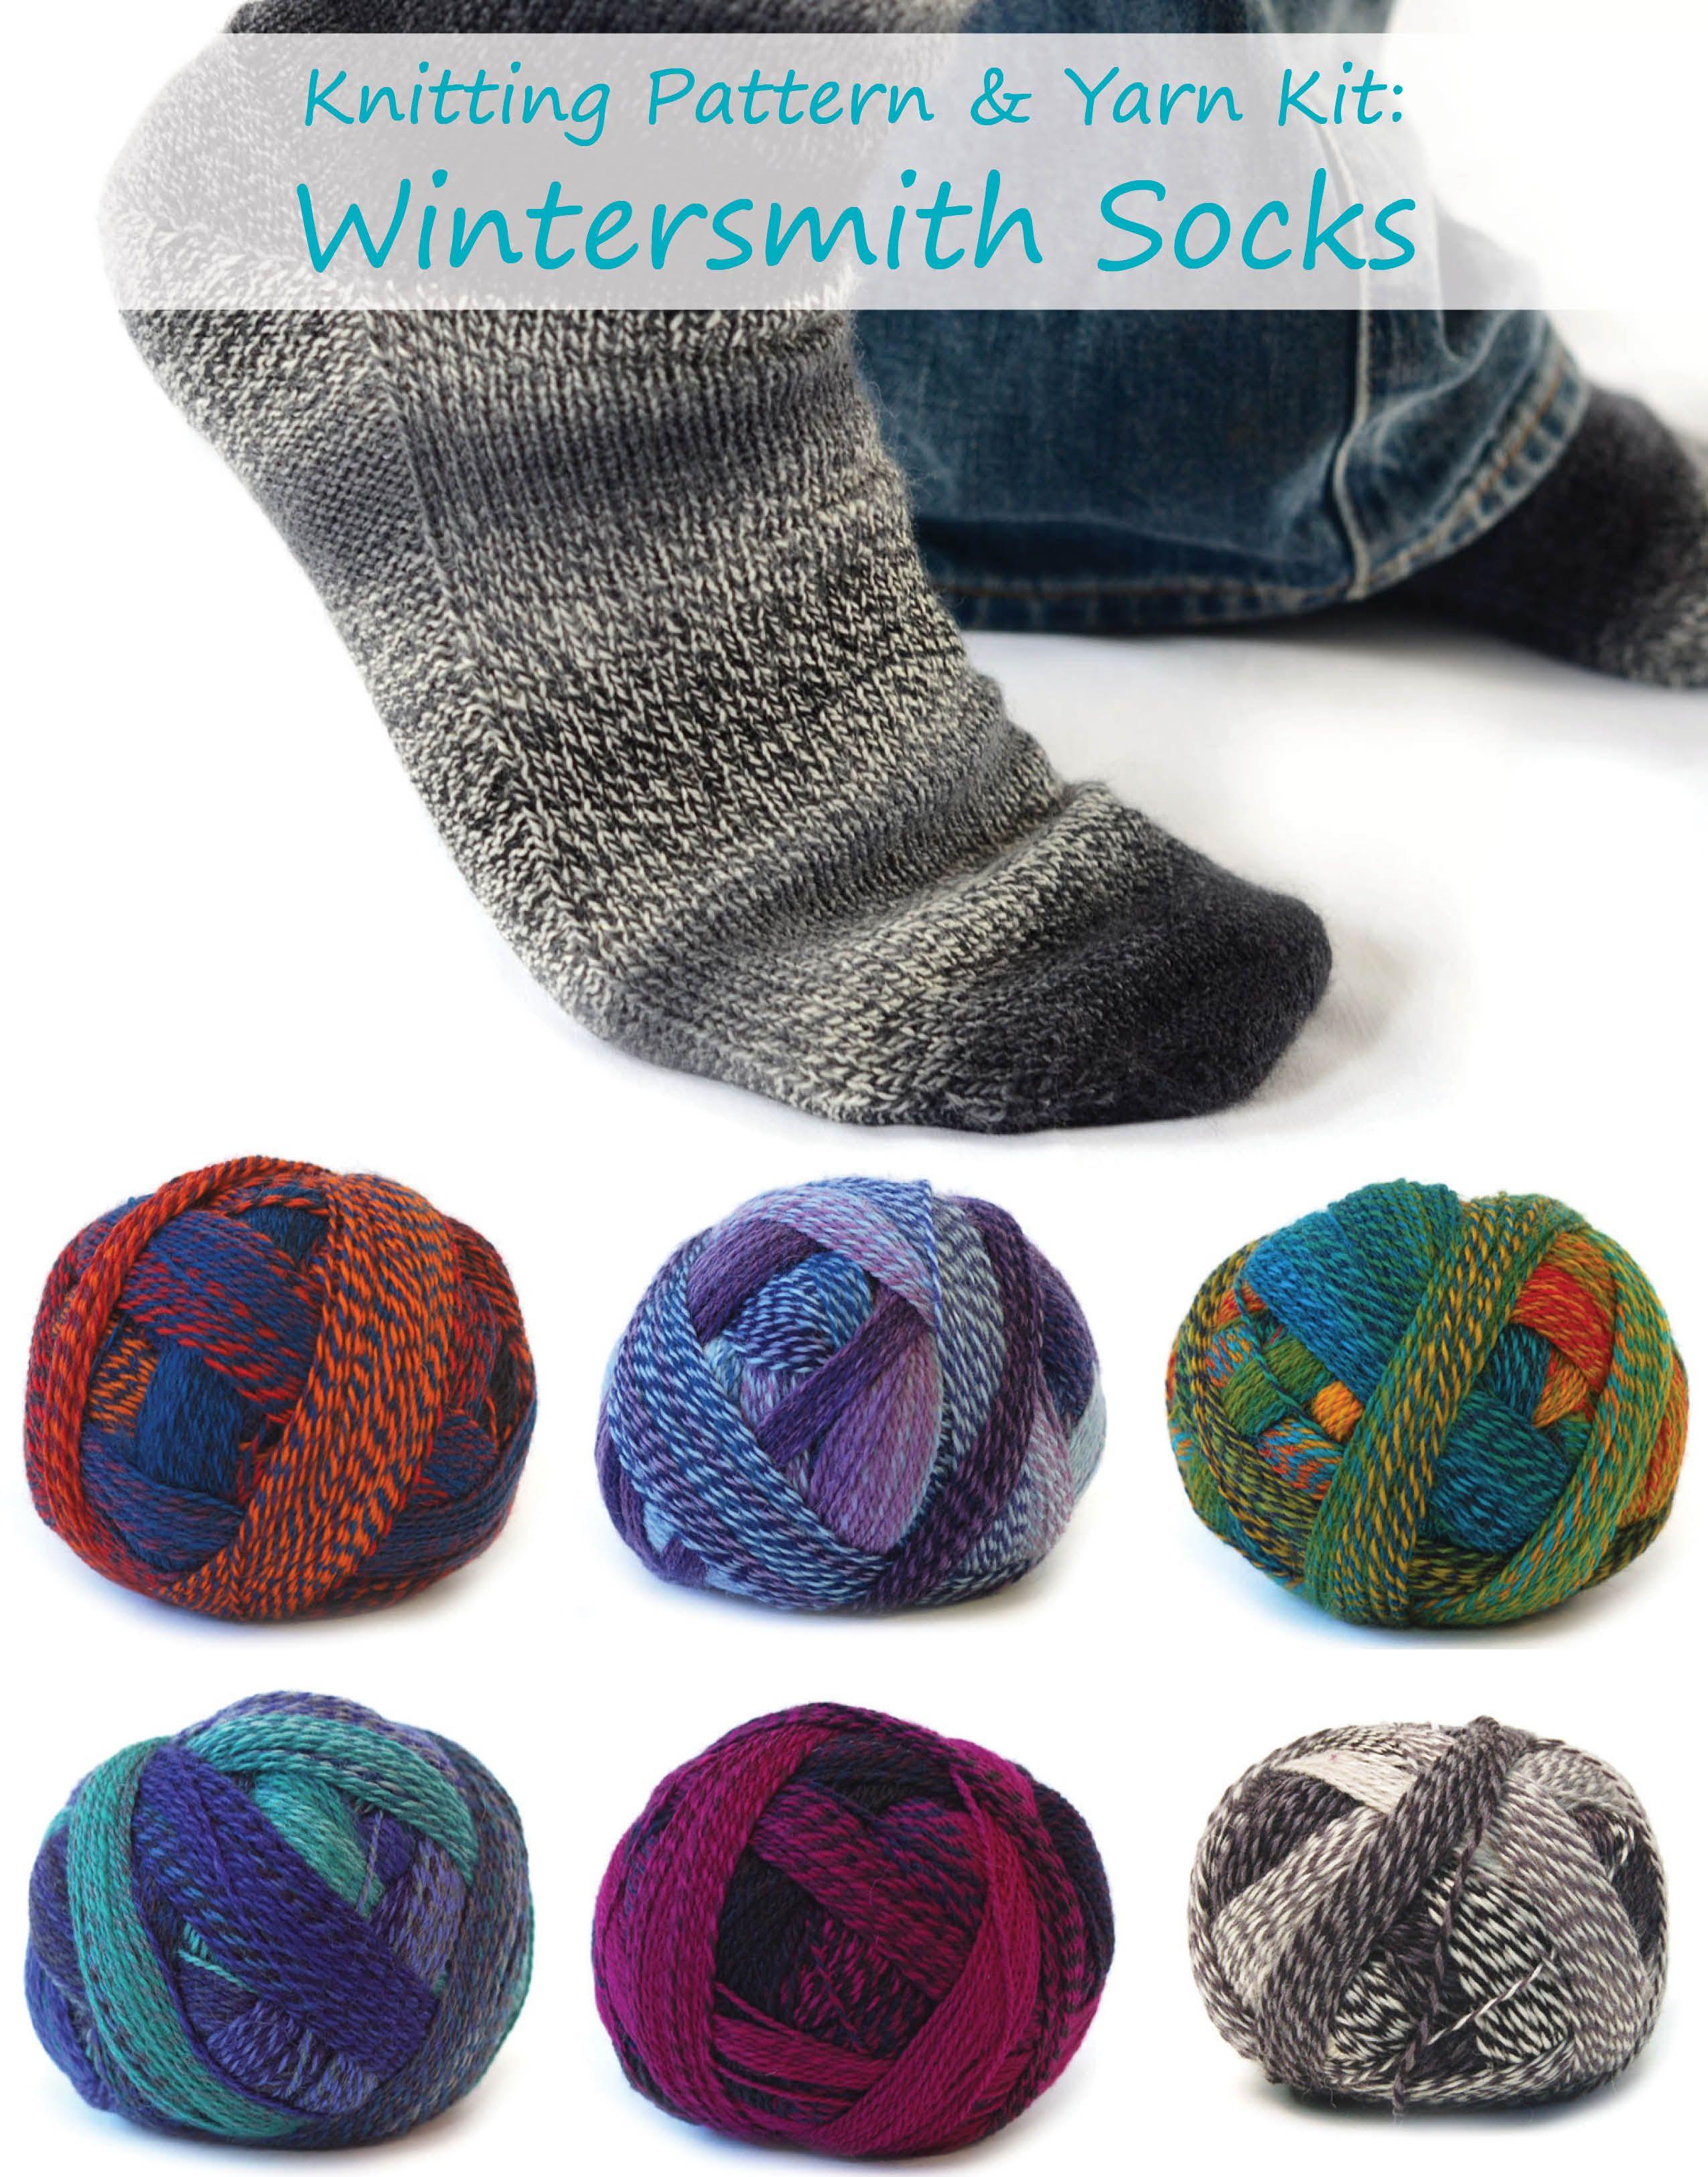 Kit - Wintersmith Socks in Crazy Zauberball | Knitting patterns ...